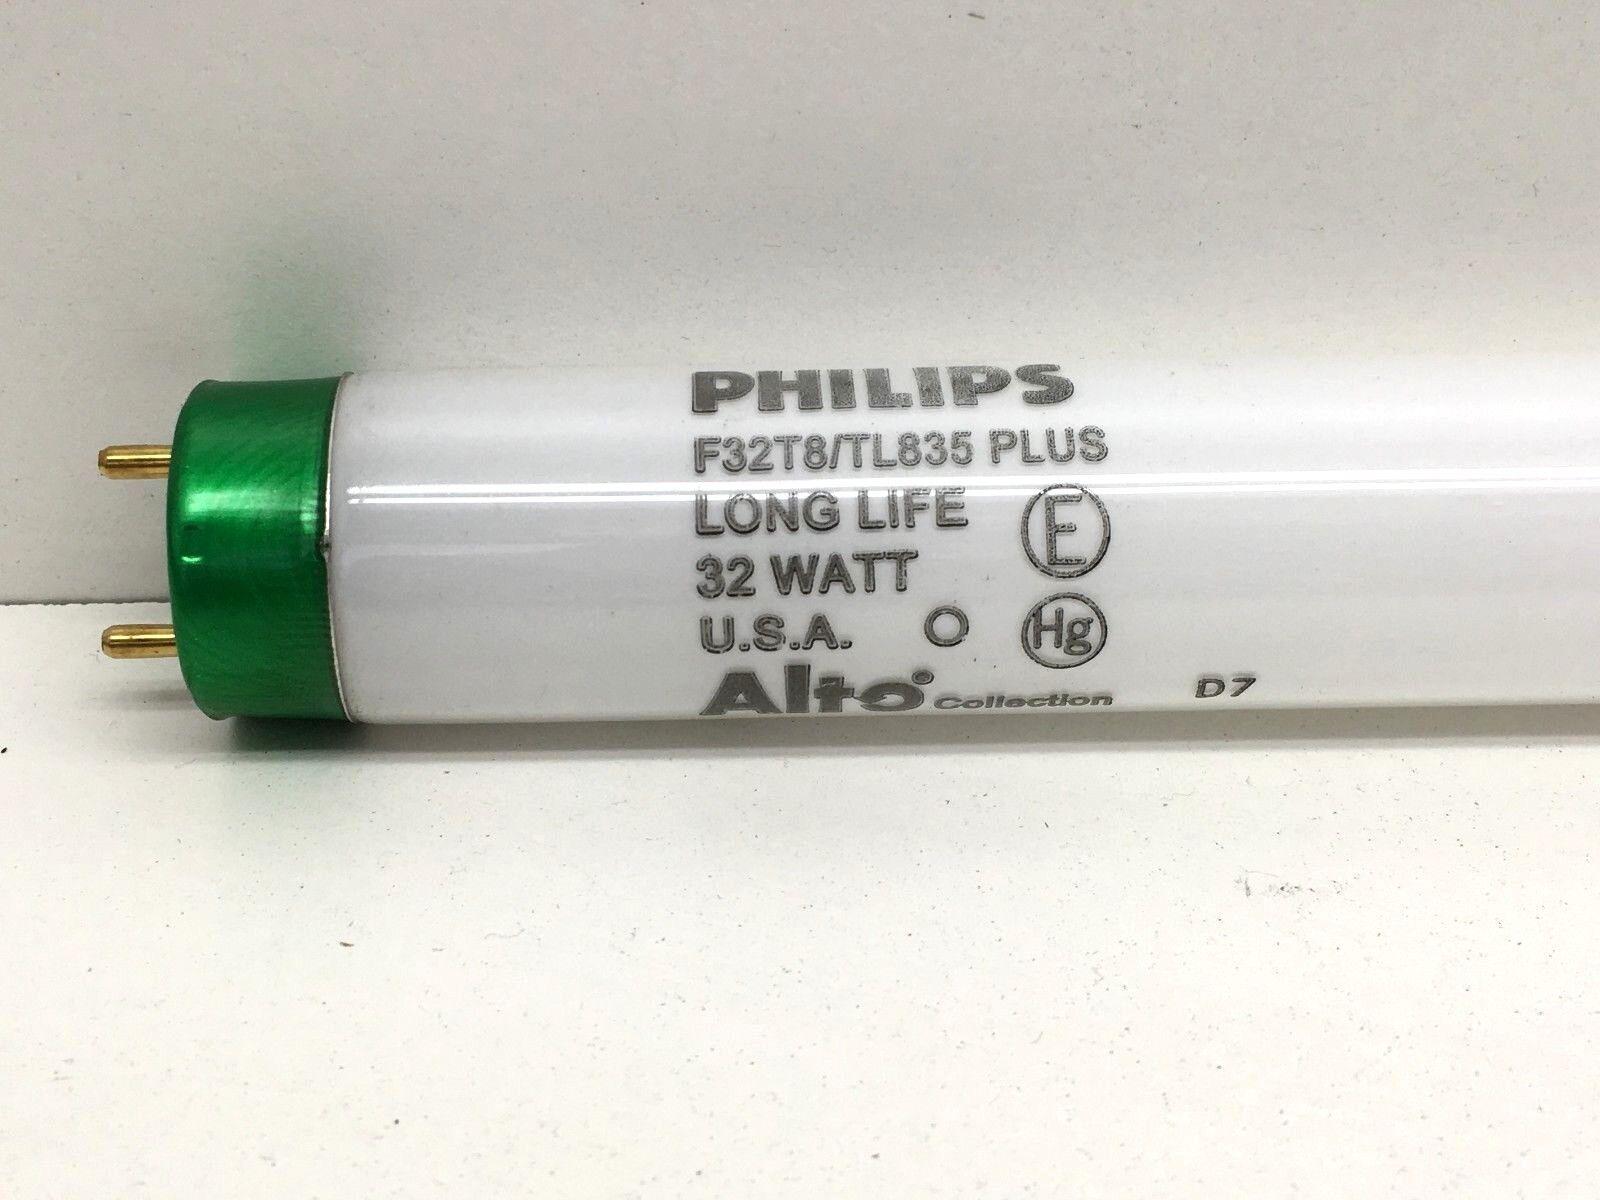 Lote de (13) Philips F32T8 TL835 Plus Fluorescente 4 ft (approx. 1.22 m) Lámpara Luz Bombilla 32 W 3500K